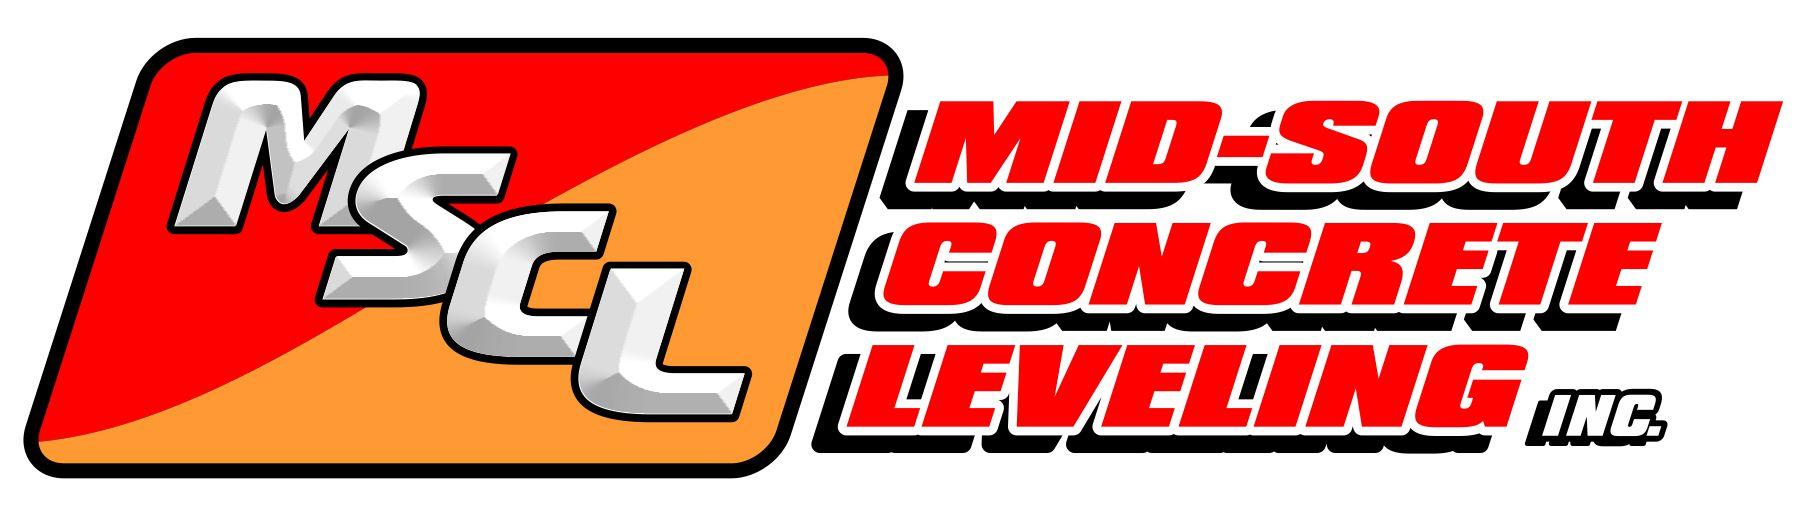 logo design mid south concrete leveling by larry elliott design